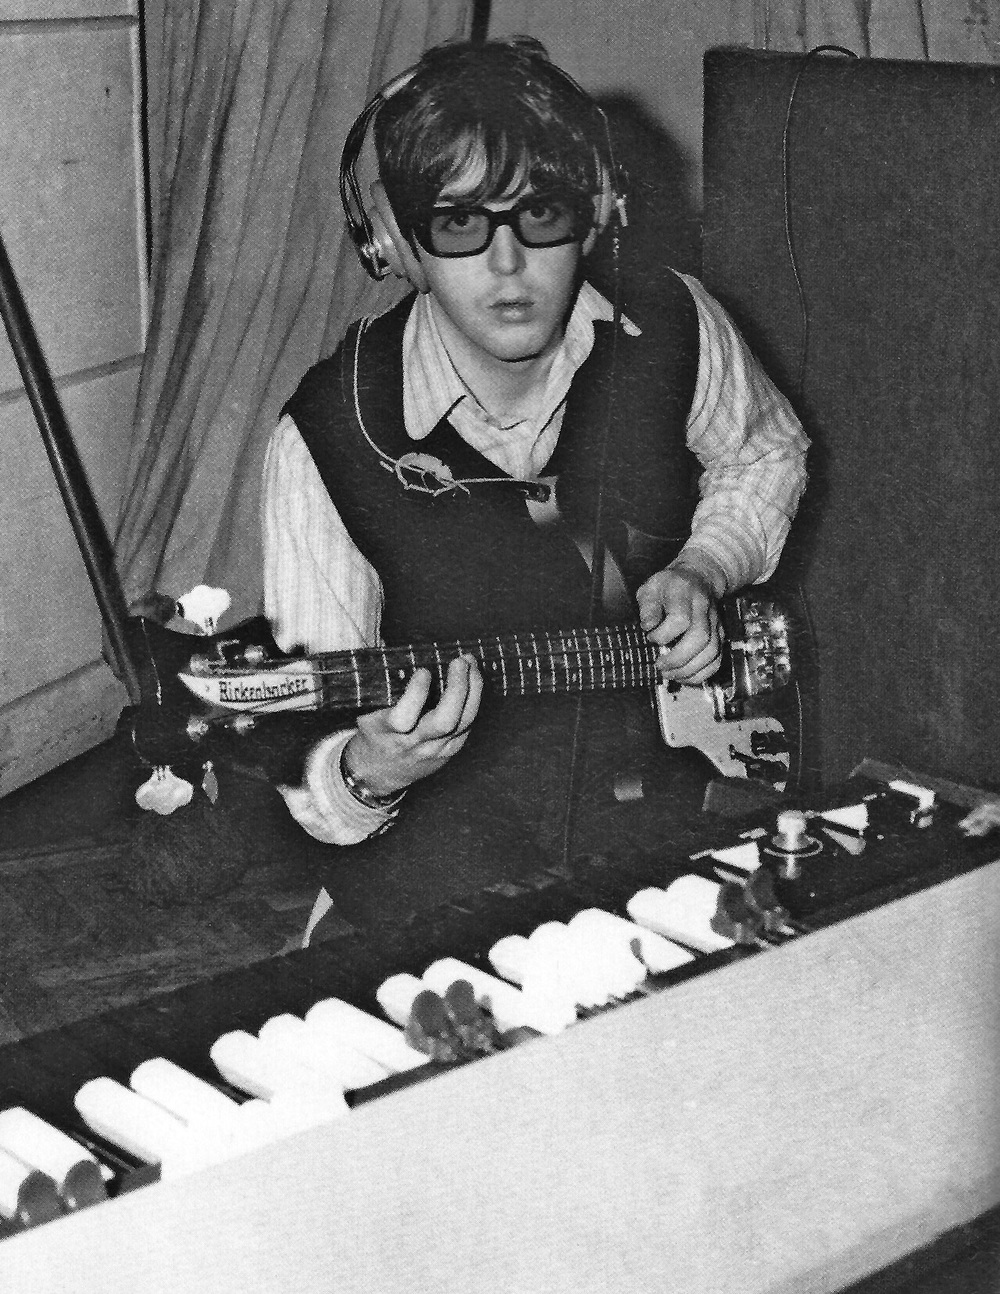 Paul McCartney circa 1966.